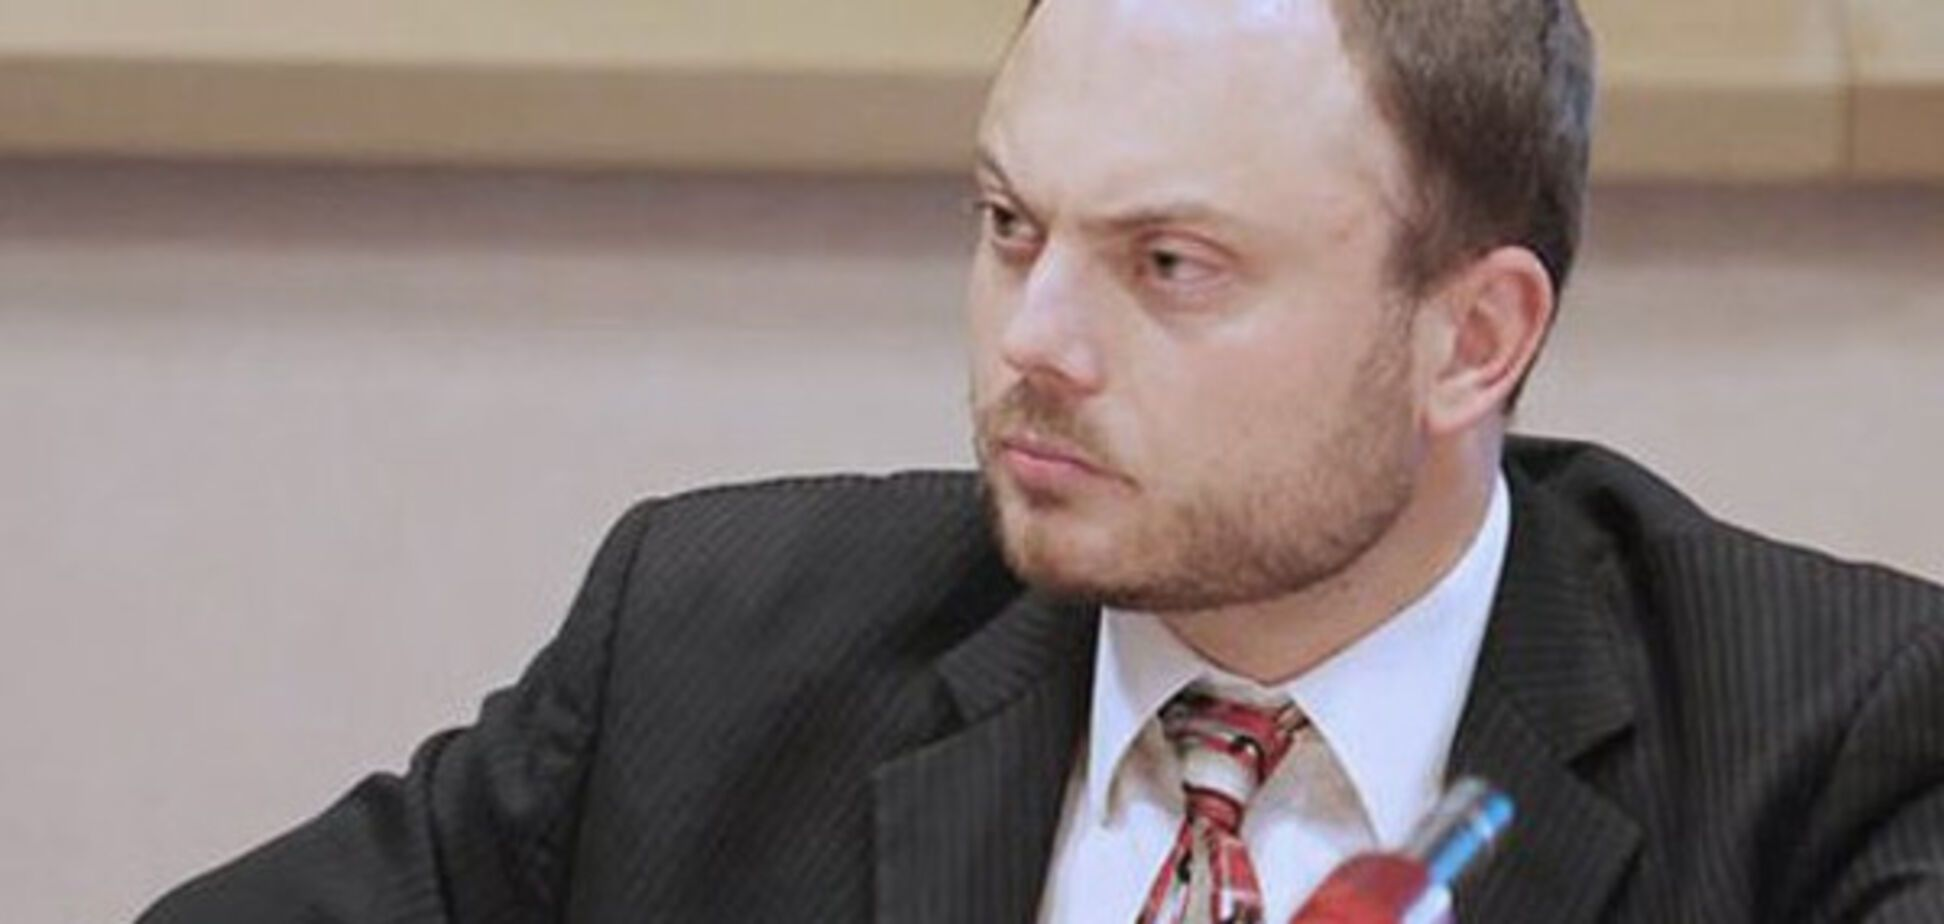 Володимир Кара-Мурза-молодший